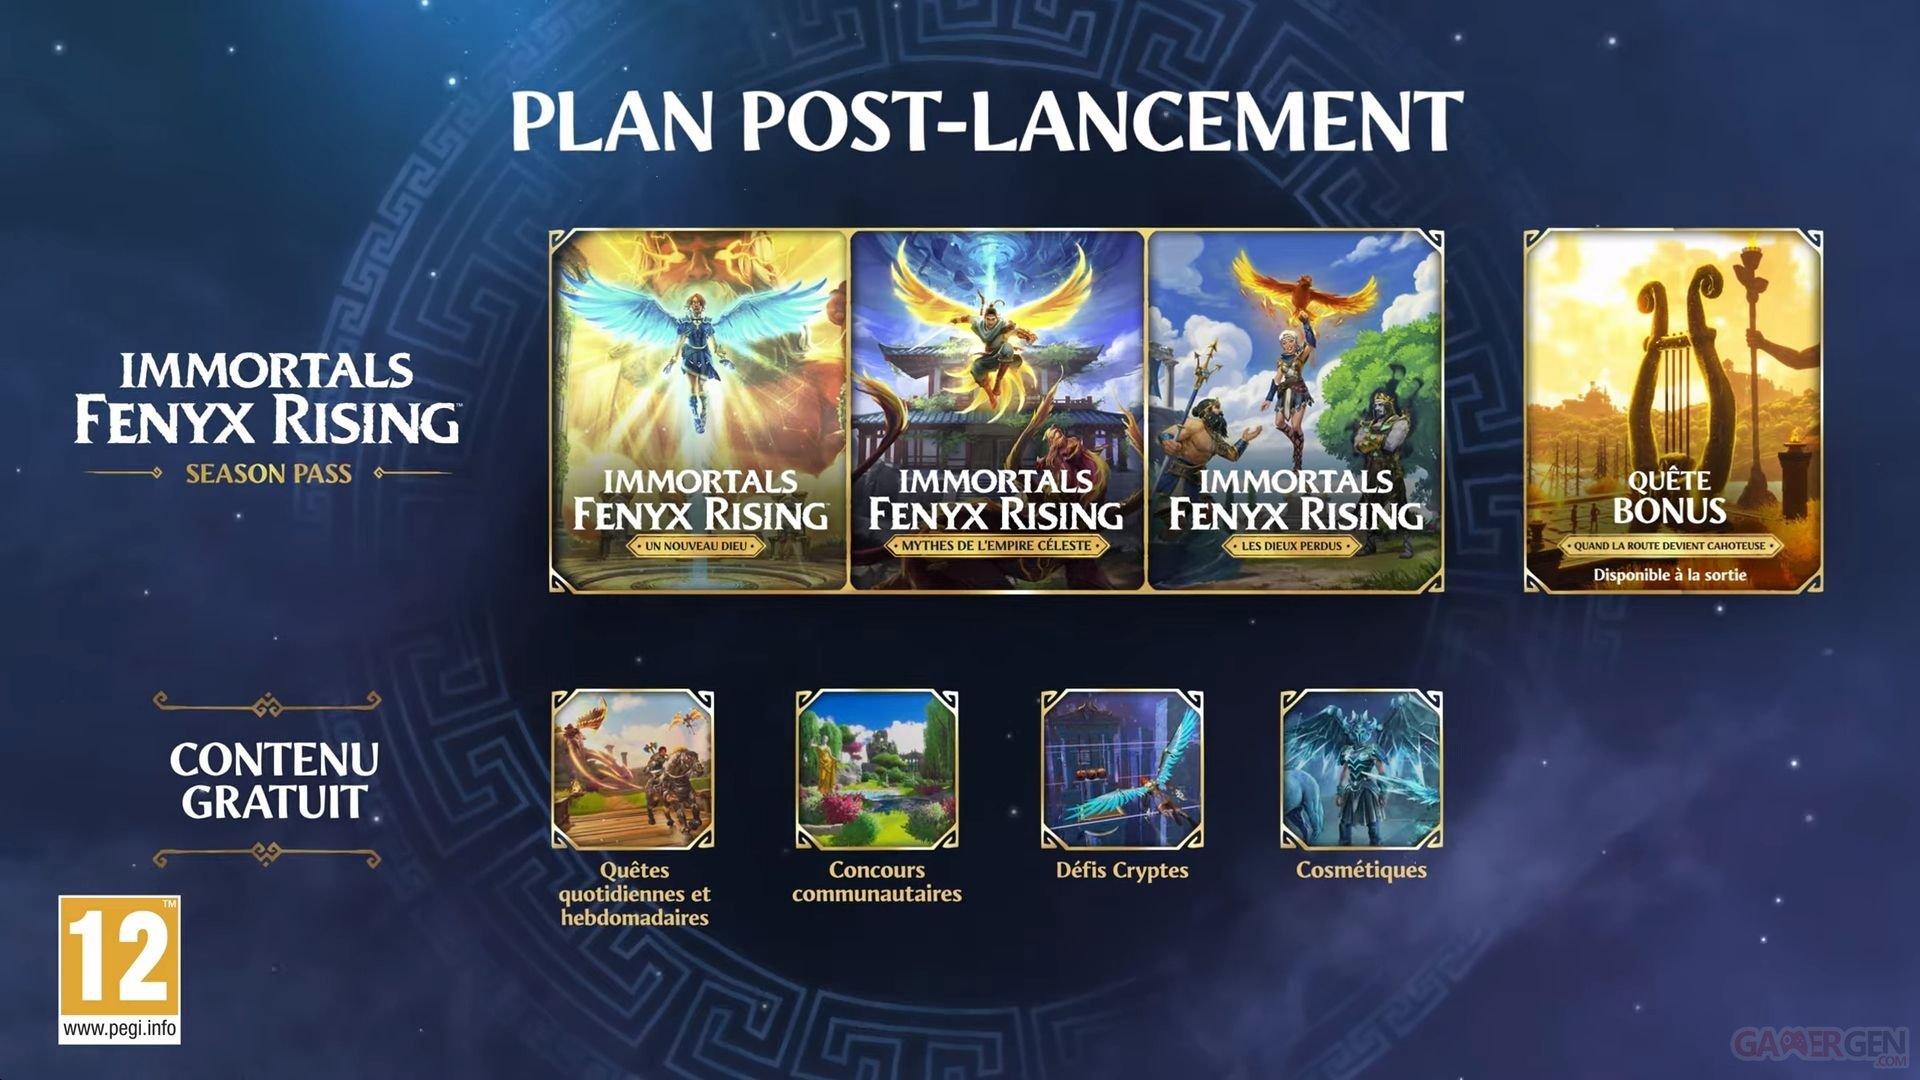 Immortals Fenyx Rising explique son contenu post-lancement